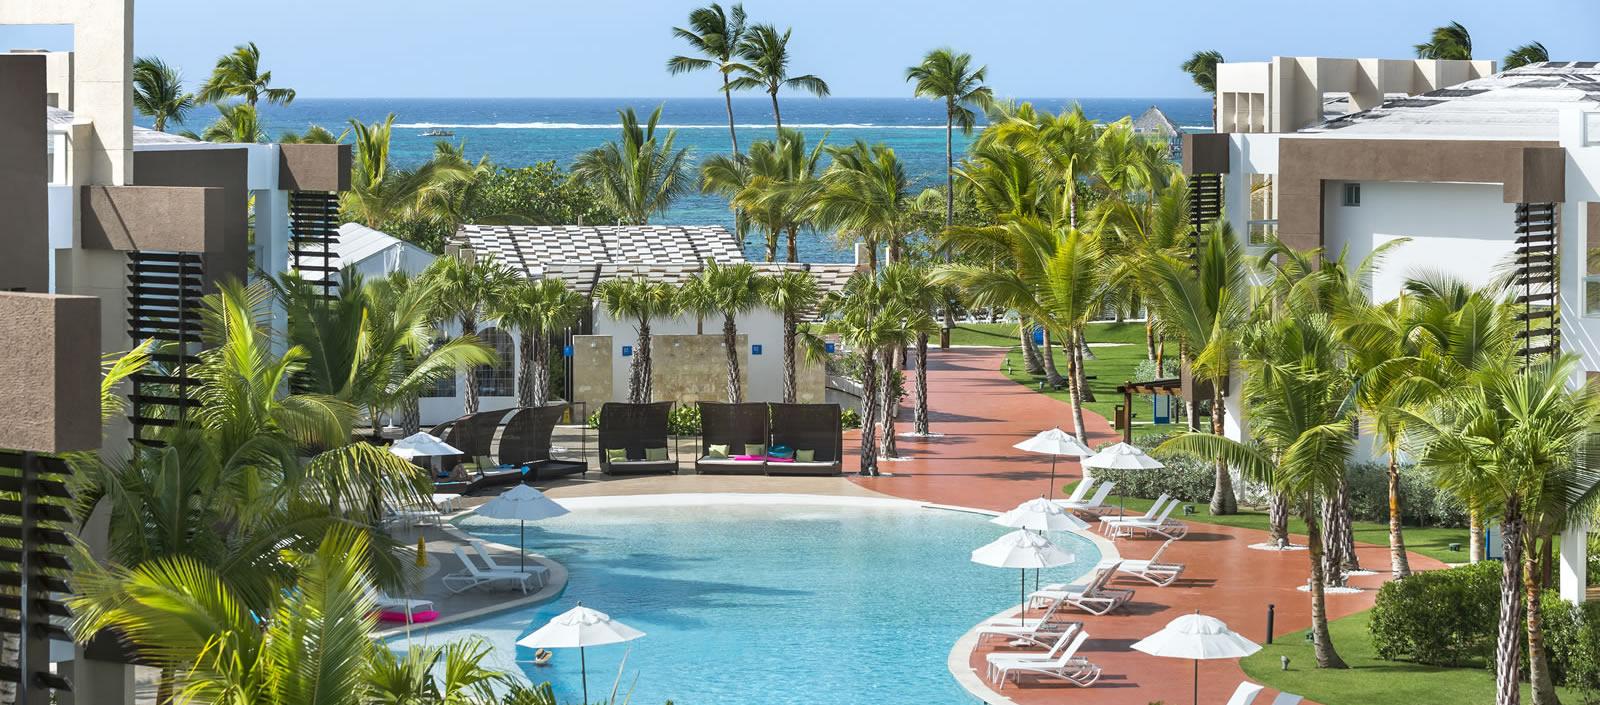 South Beach Condos Treasure Island For Sale